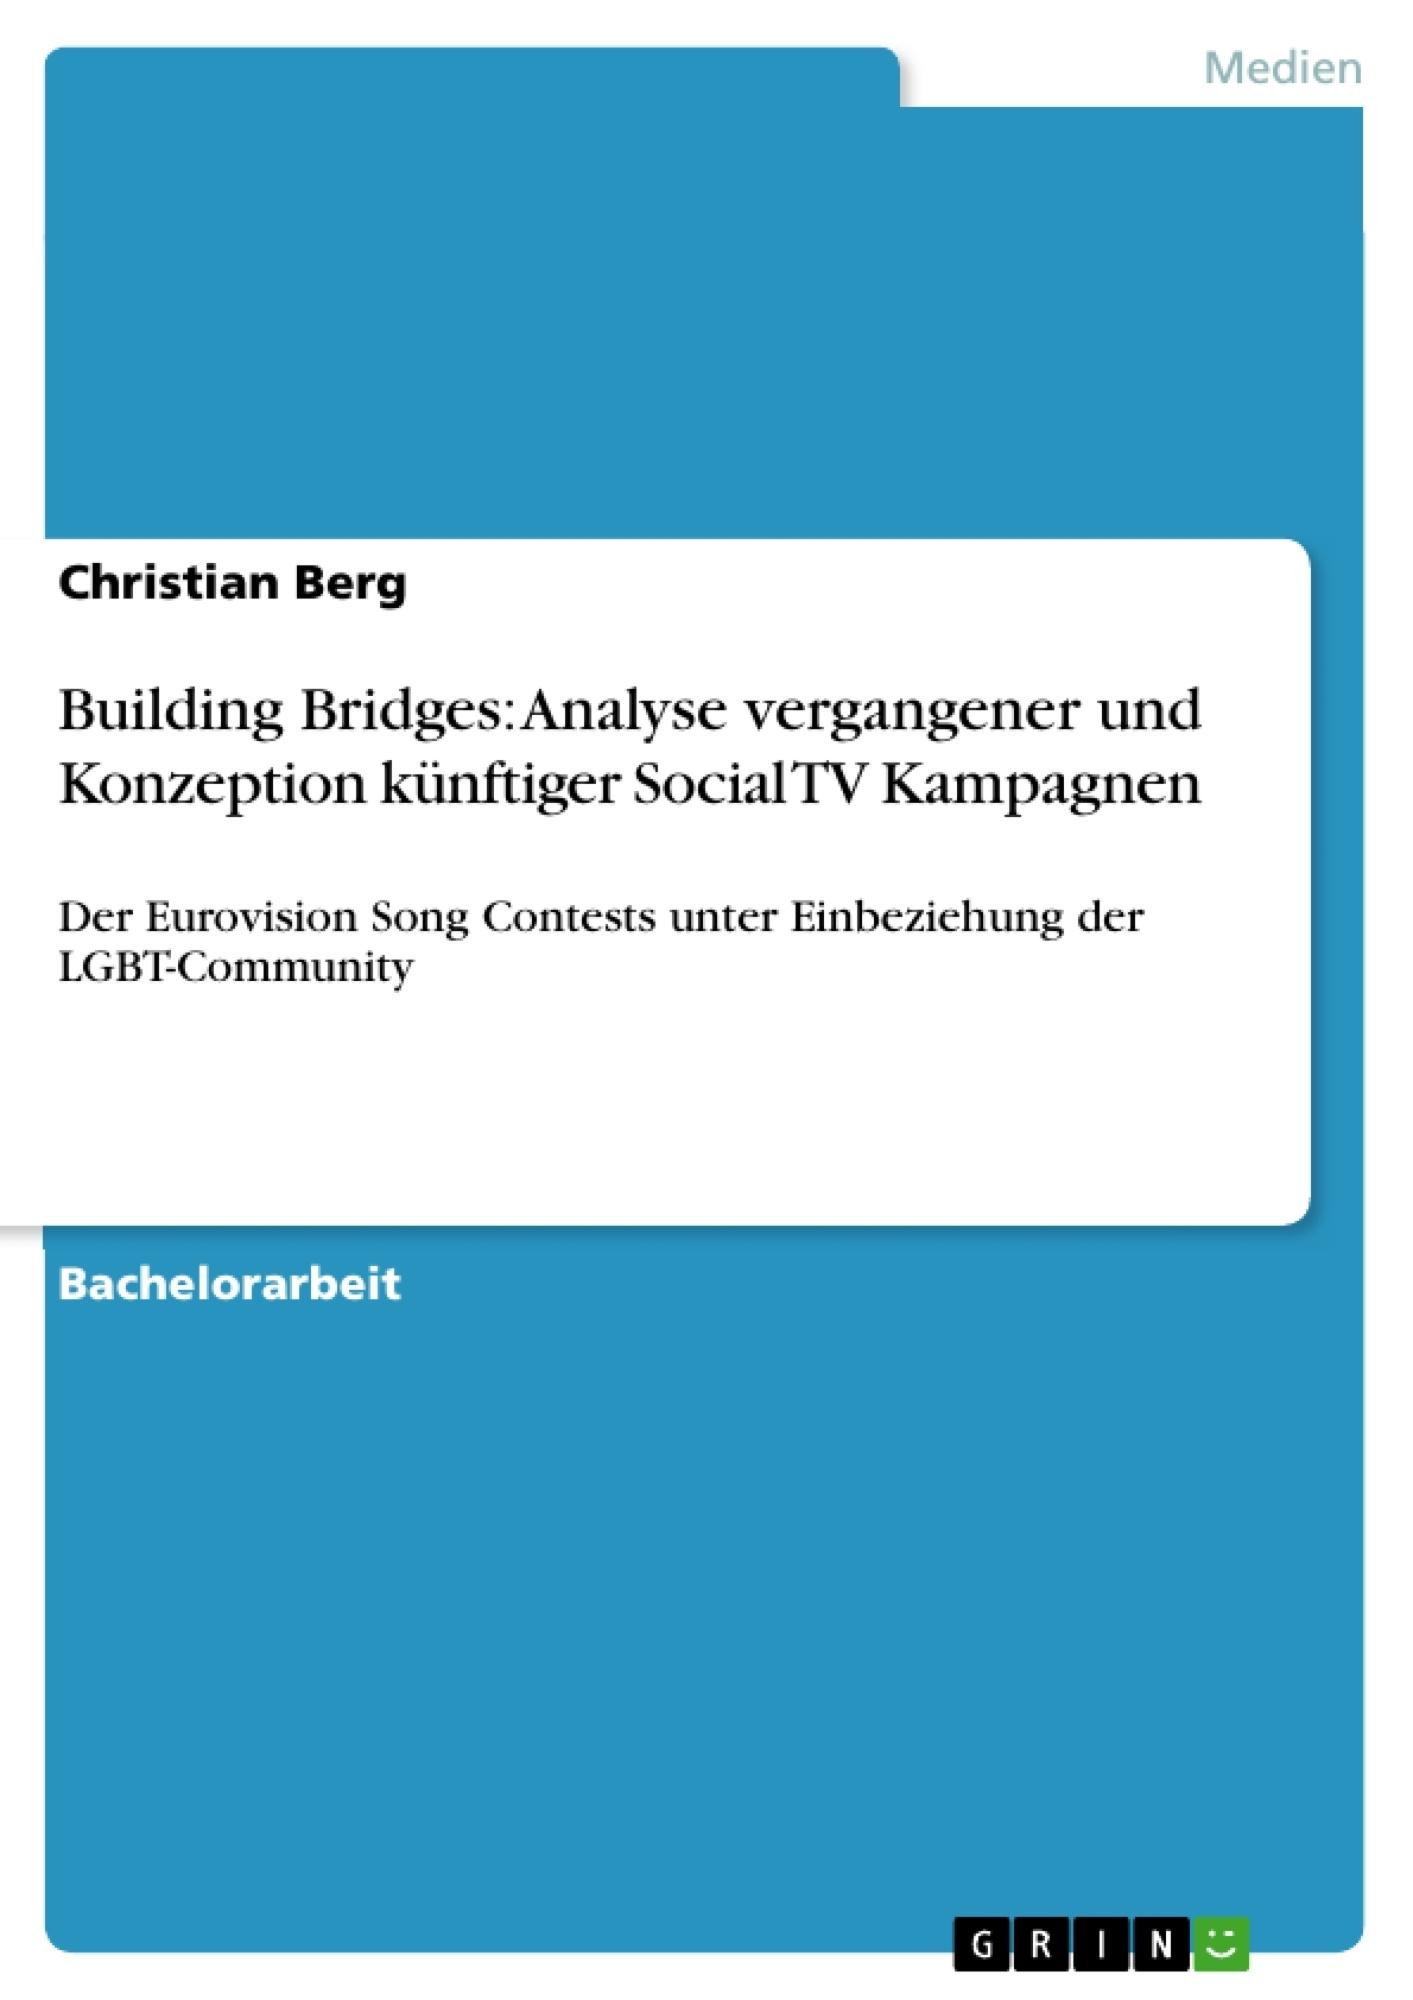 Titel: Building Bridges: Analyse vergangener und Konzeption künftiger Social TV Kampagnen